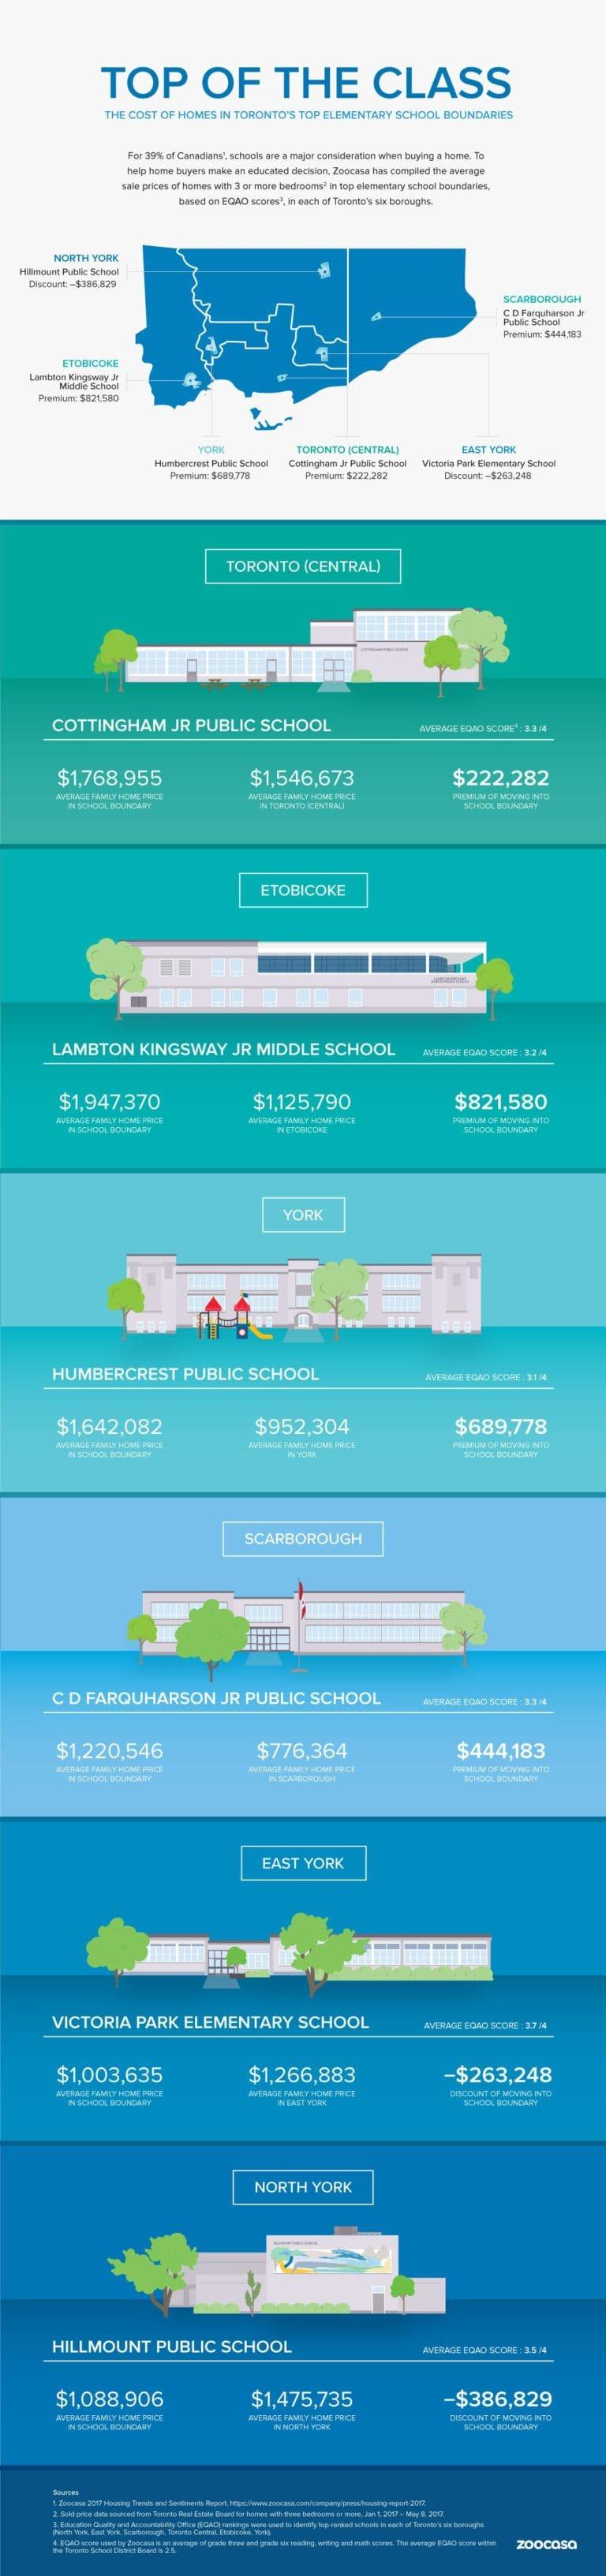 Search-Home-for-Sale-by-School-Zoocasa-RentSeeker